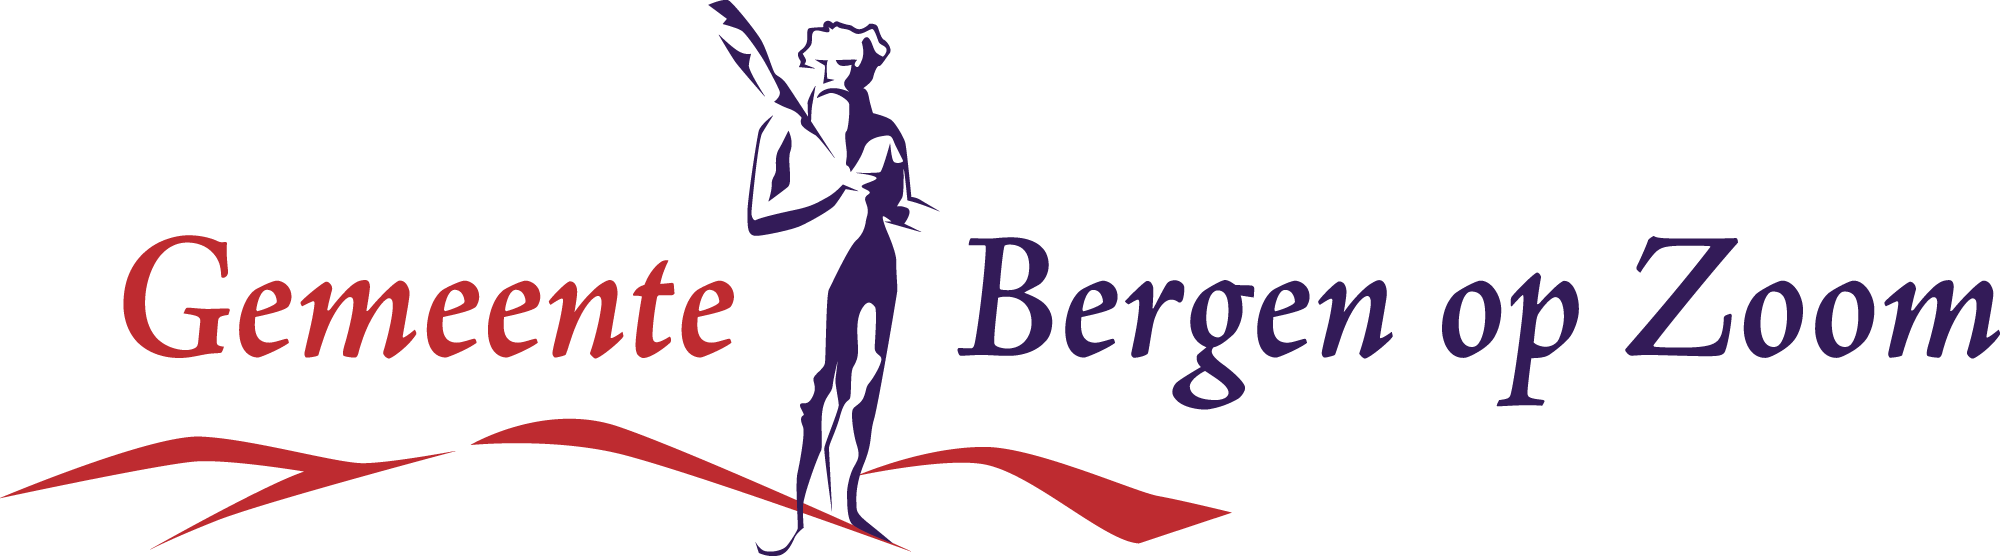 Gemeente-logo-transparant- hoge resolutie